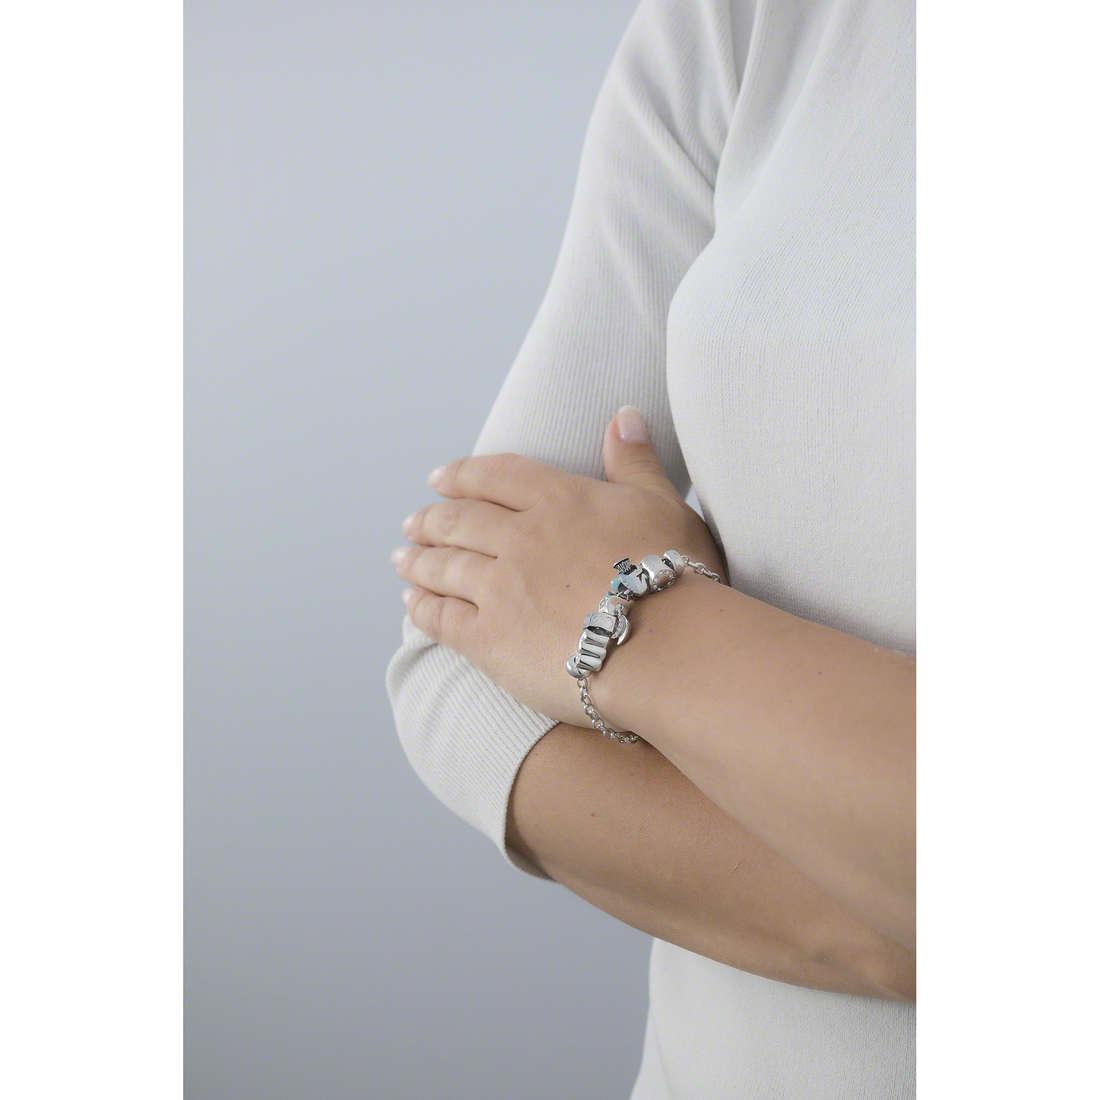 Morellato bracelets Drops femme SCZ688 indosso